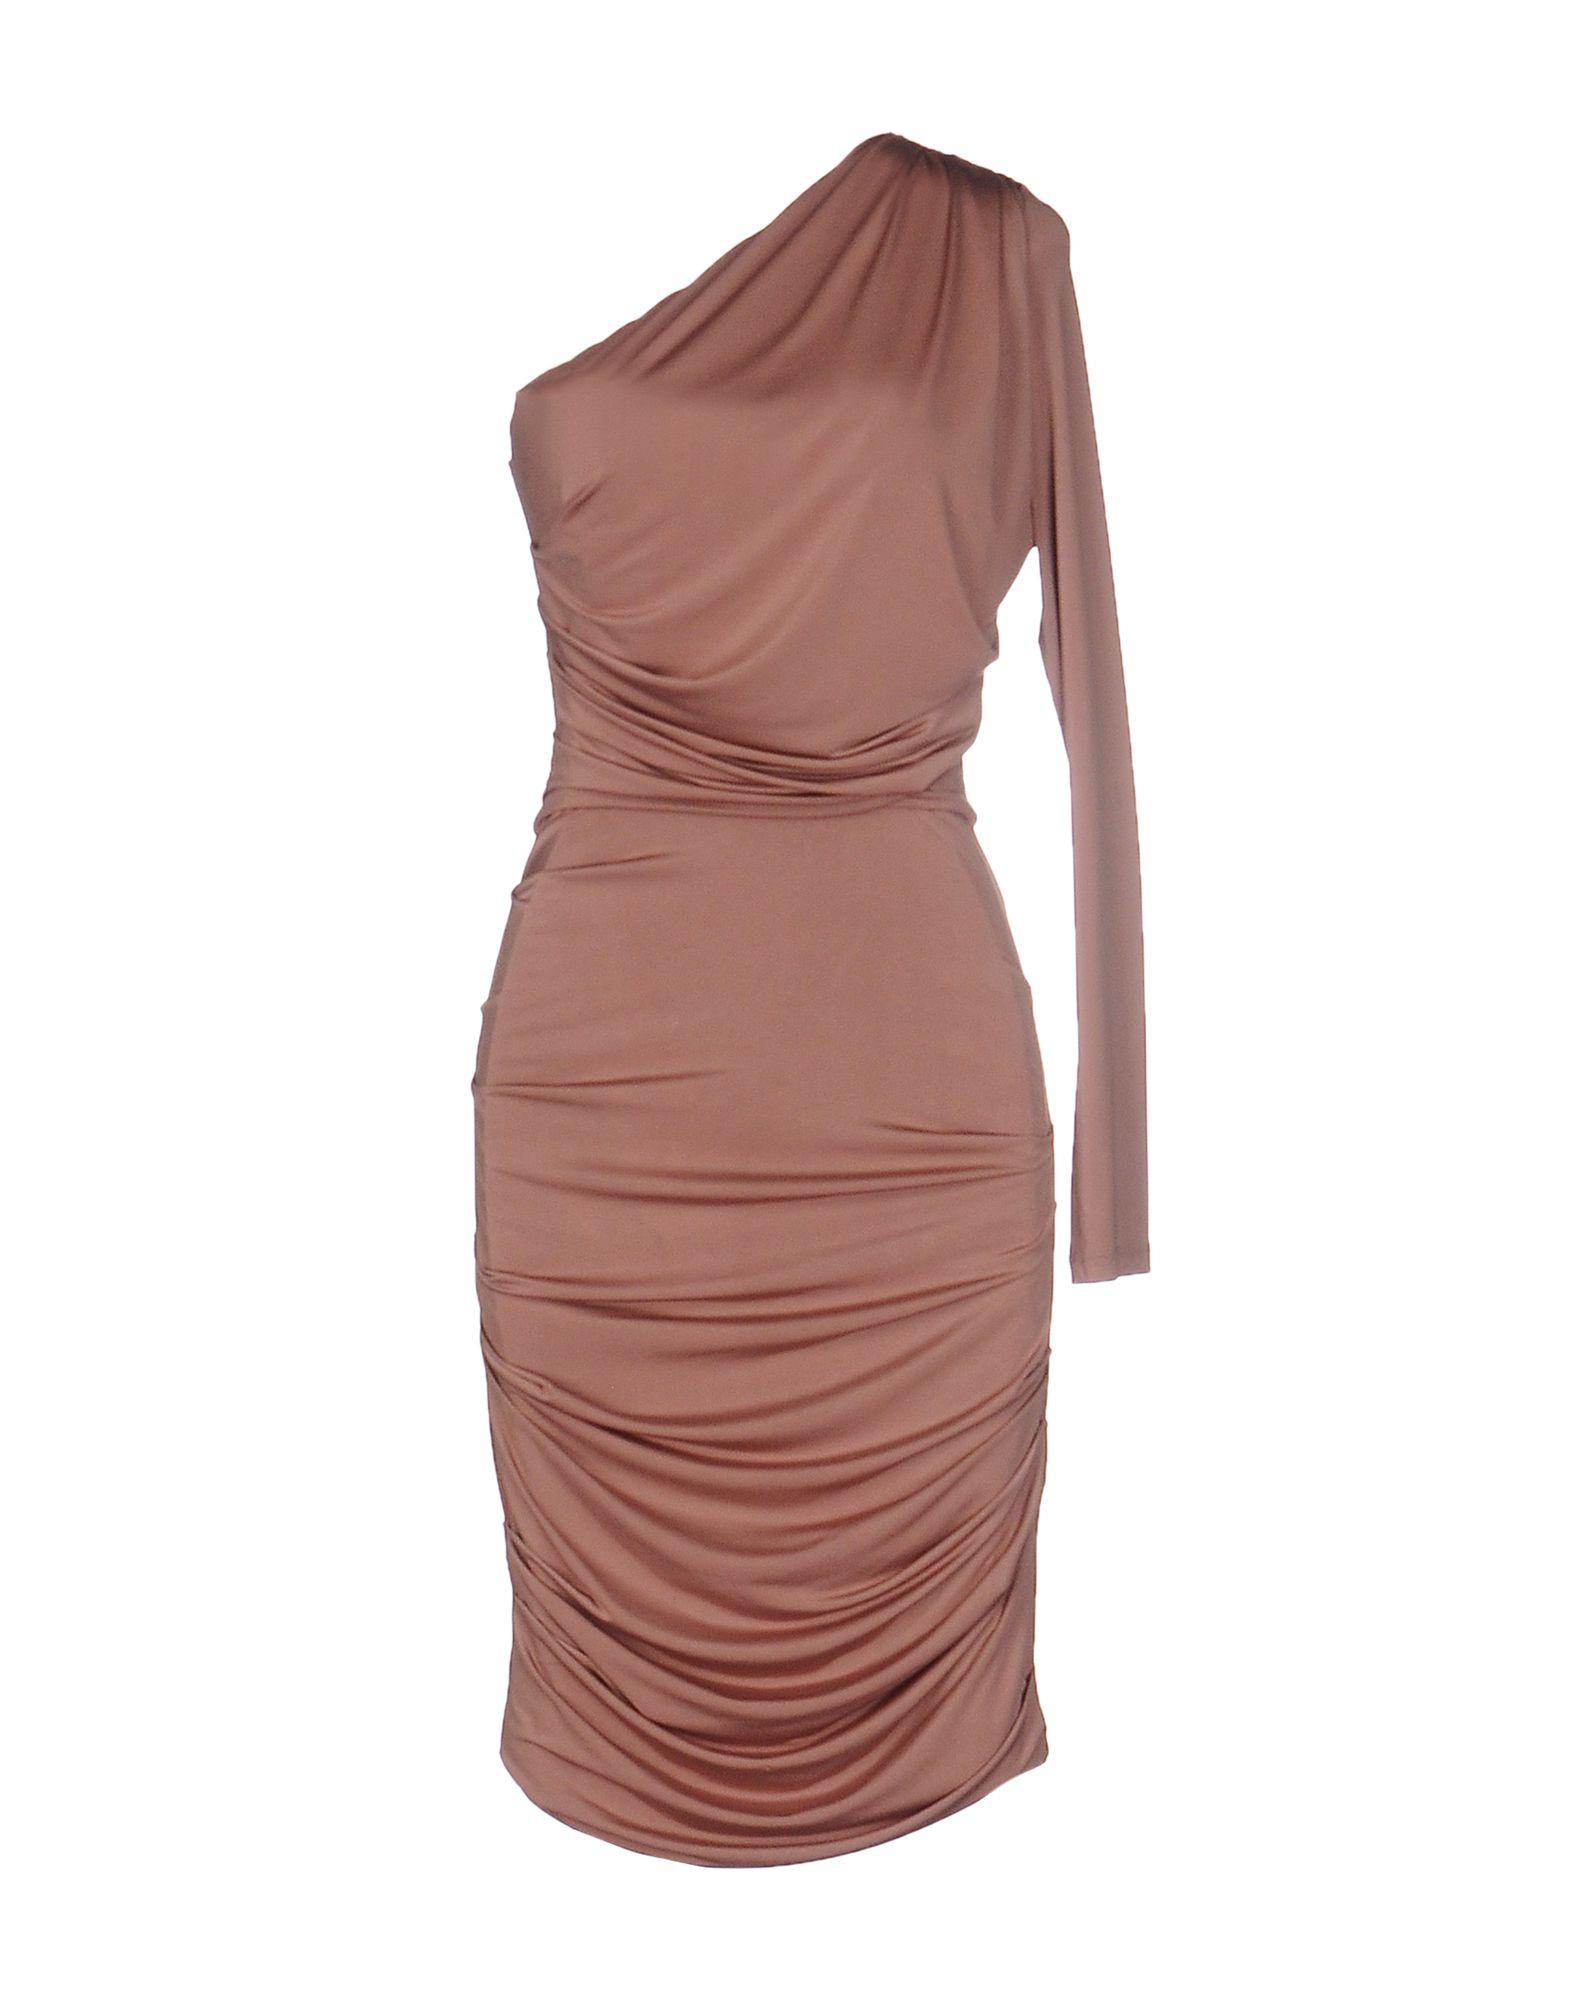 15 Spektakulär Desigual Abendkleid StylishFormal Einfach Desigual Abendkleid Spezialgebiet